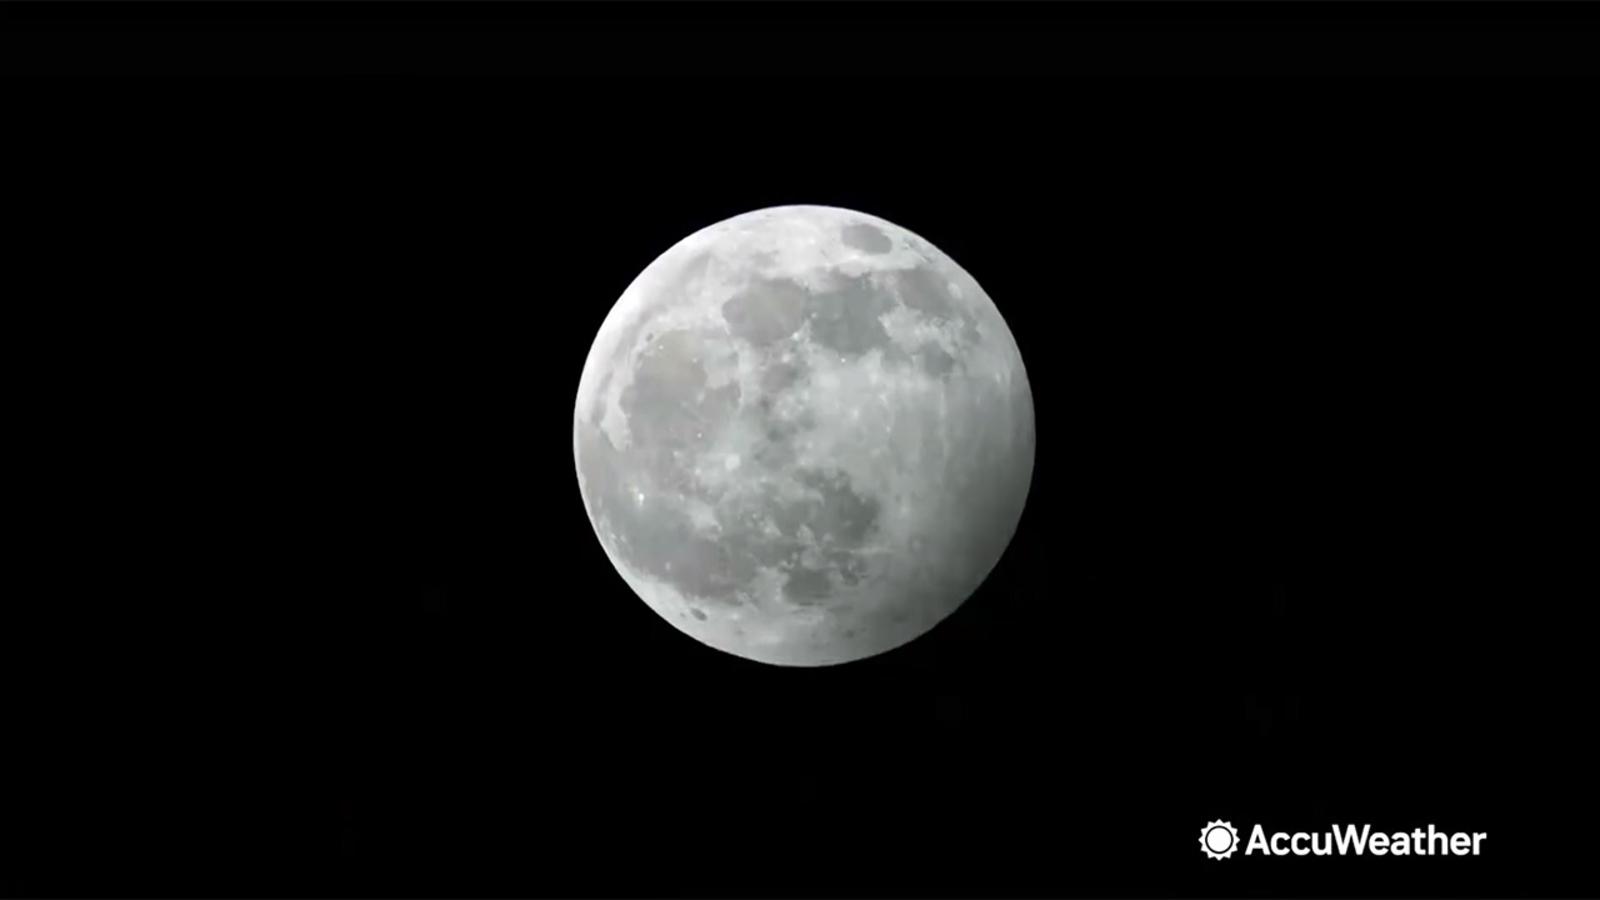 Lunar eclipse to darken the moon on Fourth of July - KABC-TV